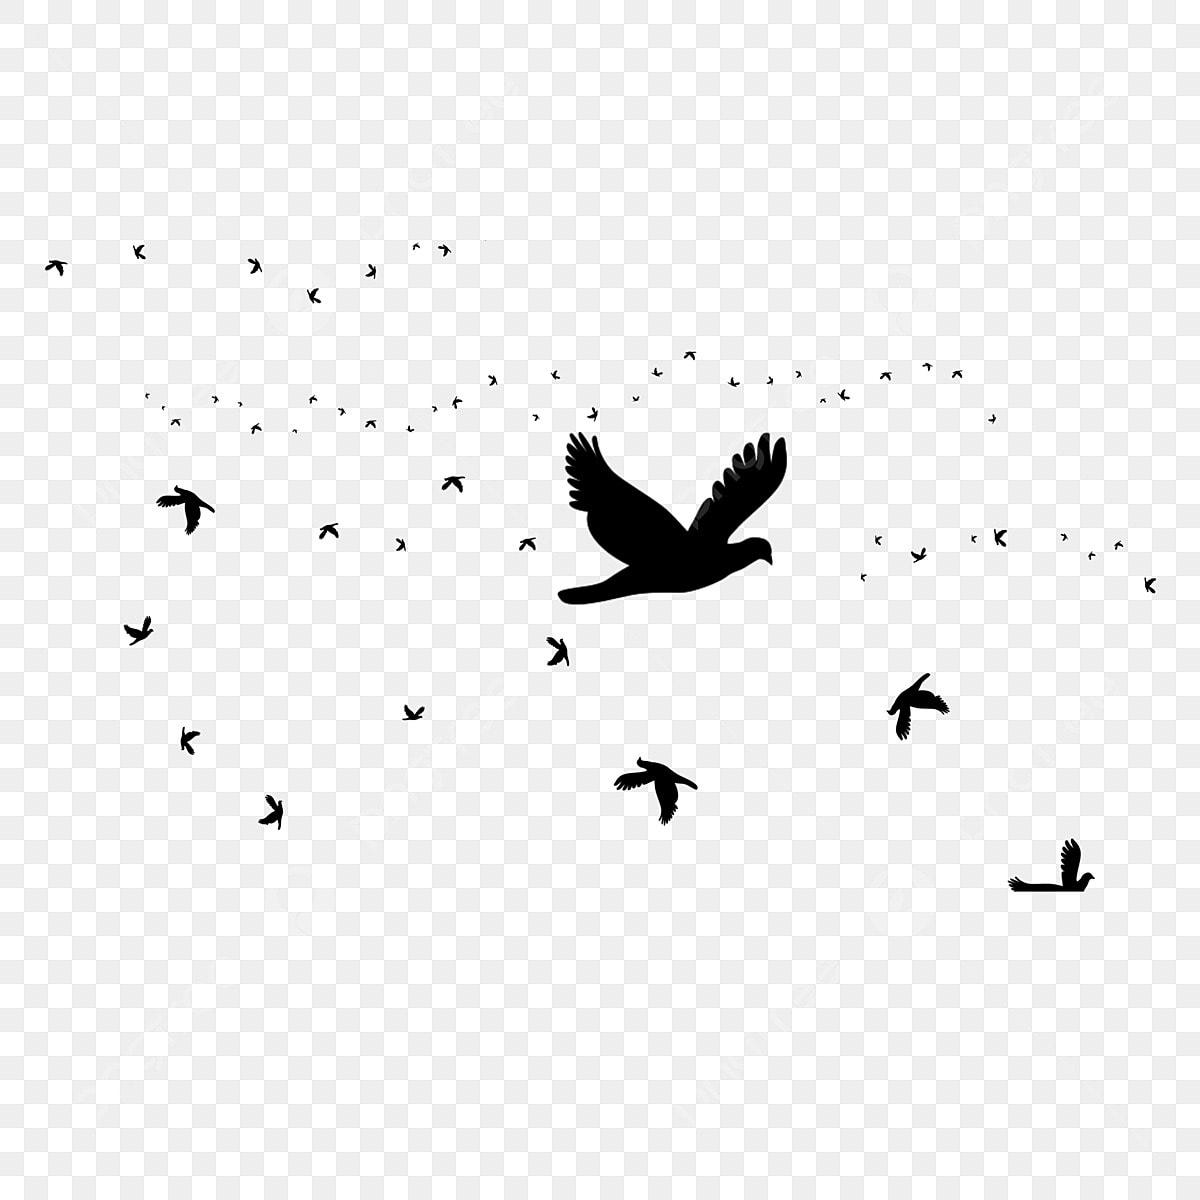 fresh black bird decorative element  flying bird  animal  little bird png transparent clipart